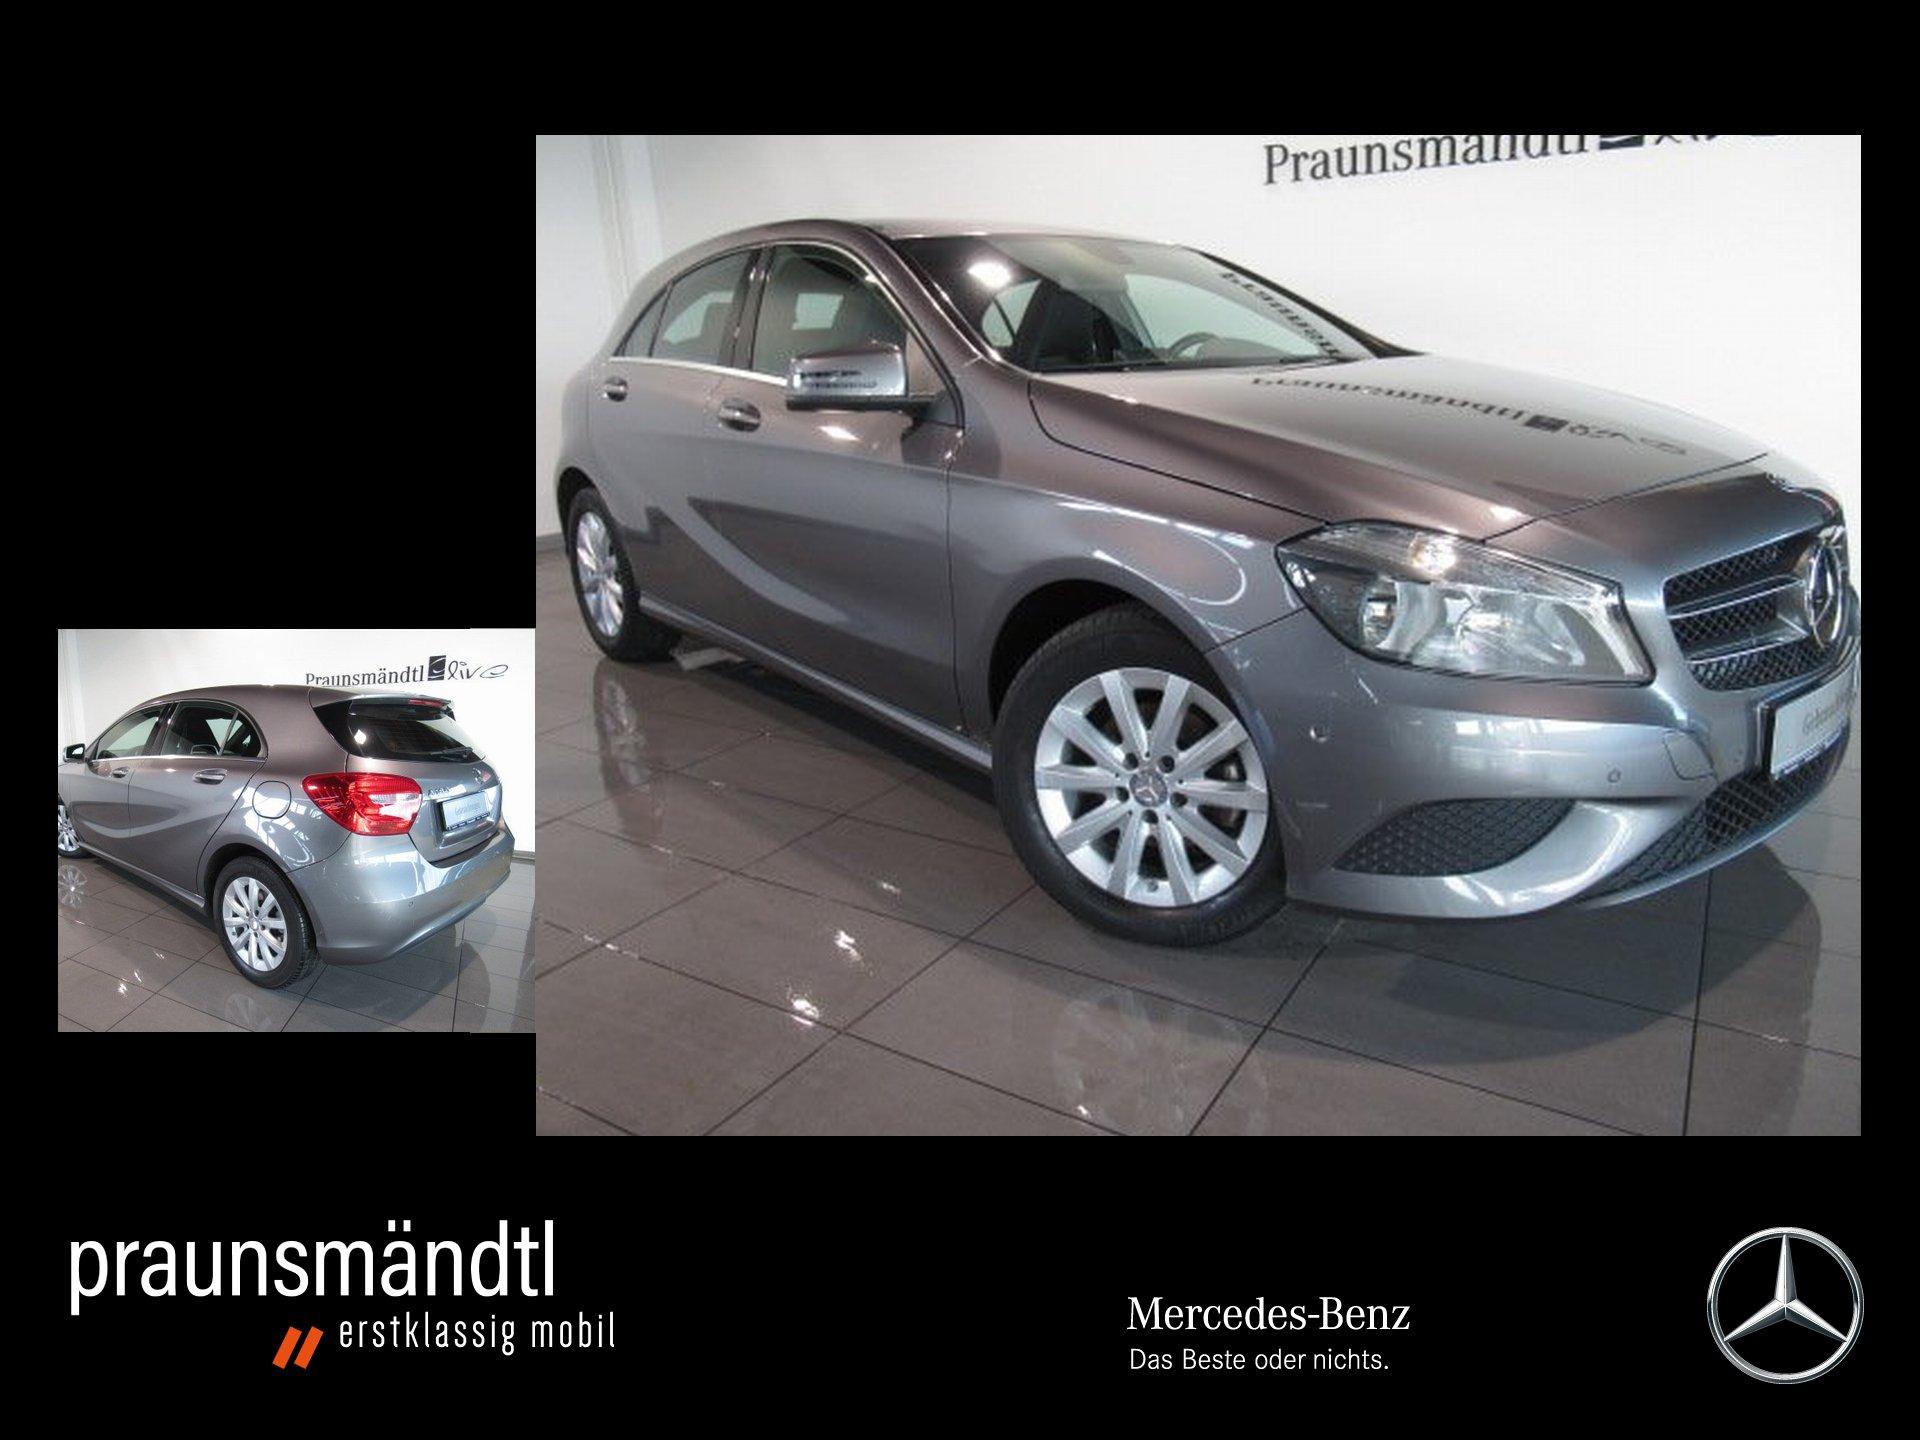 Mercedes-Benz A 180 CDI Style Navi/AHK/Sitzhzg/PTS/LMR/Euro 6, Jahr 2015, Diesel